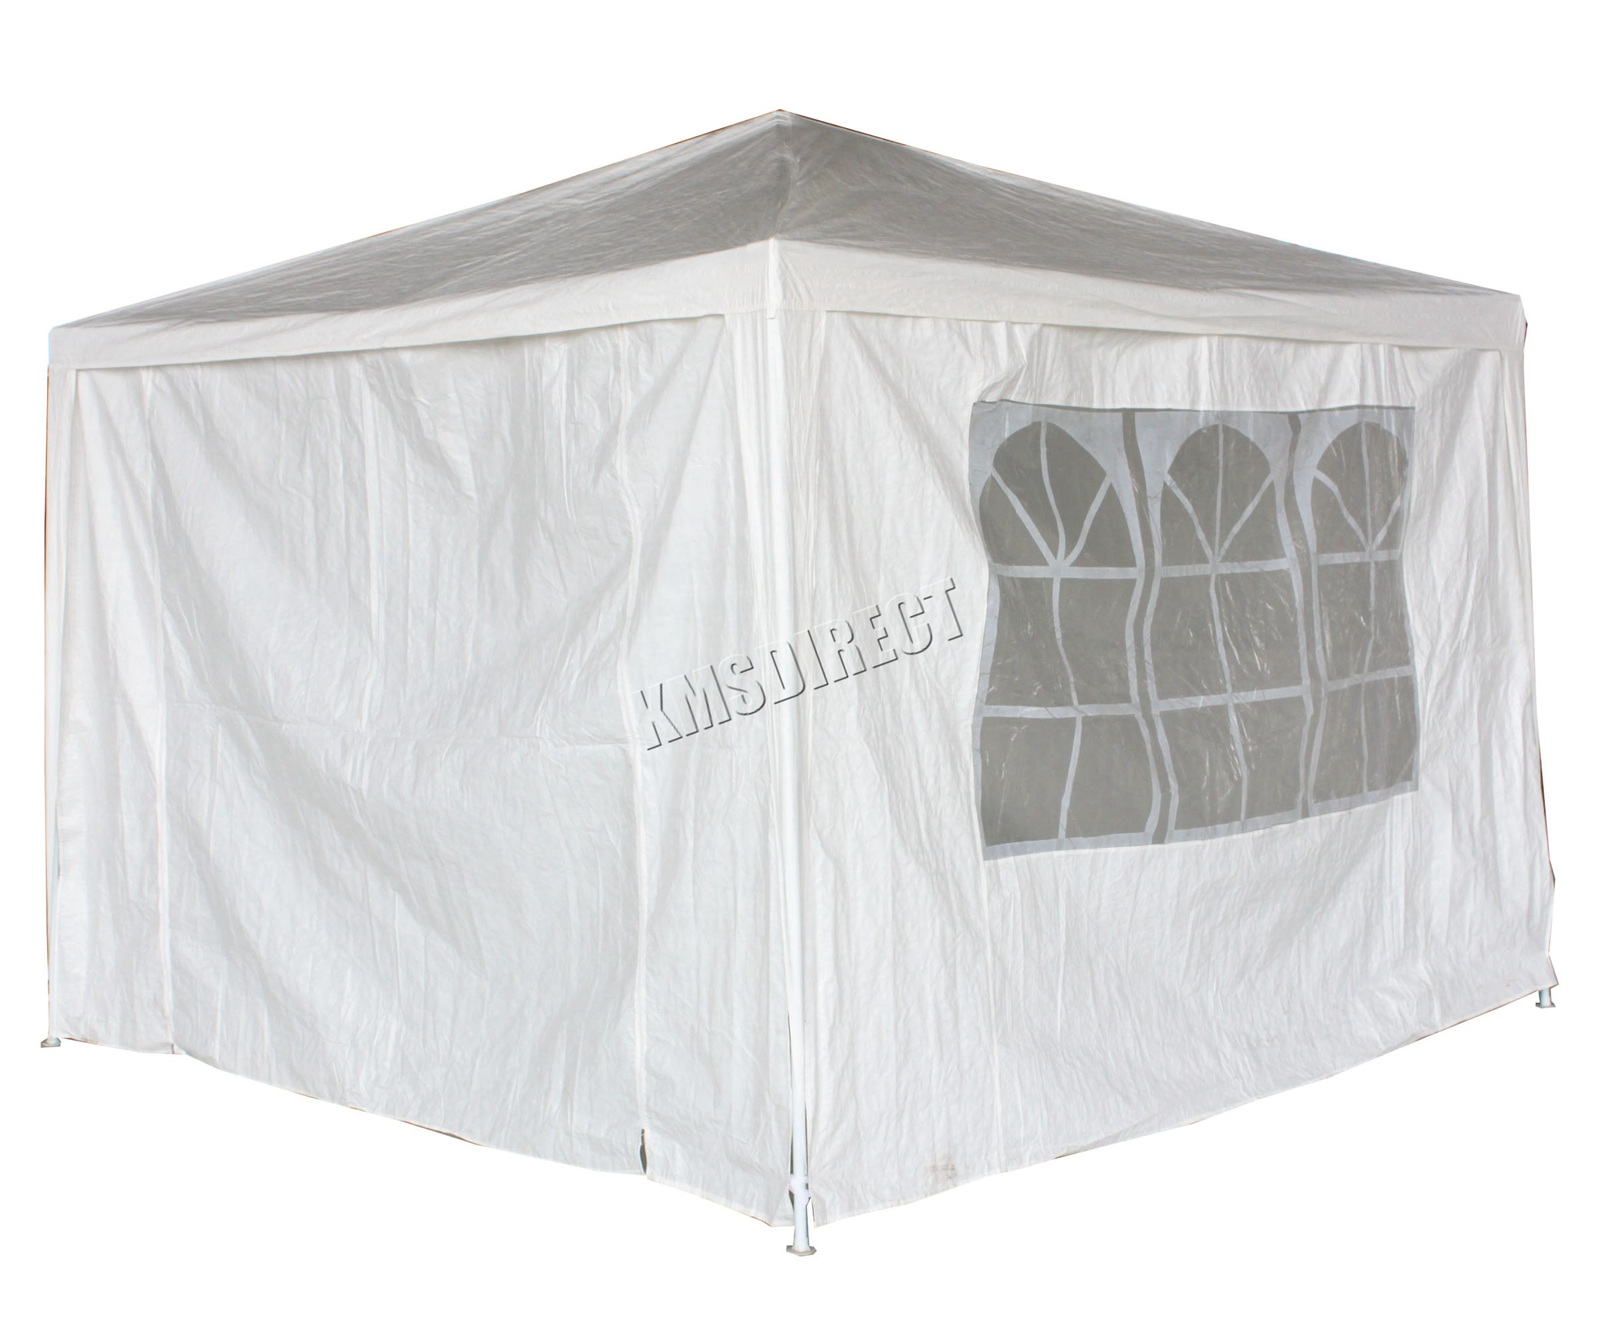 New-3-x-3m-120g-Waterproof-Outdoor-PE-Garden-Gazebo-Marquee-Canopy-Party-Tent Indexbild 29